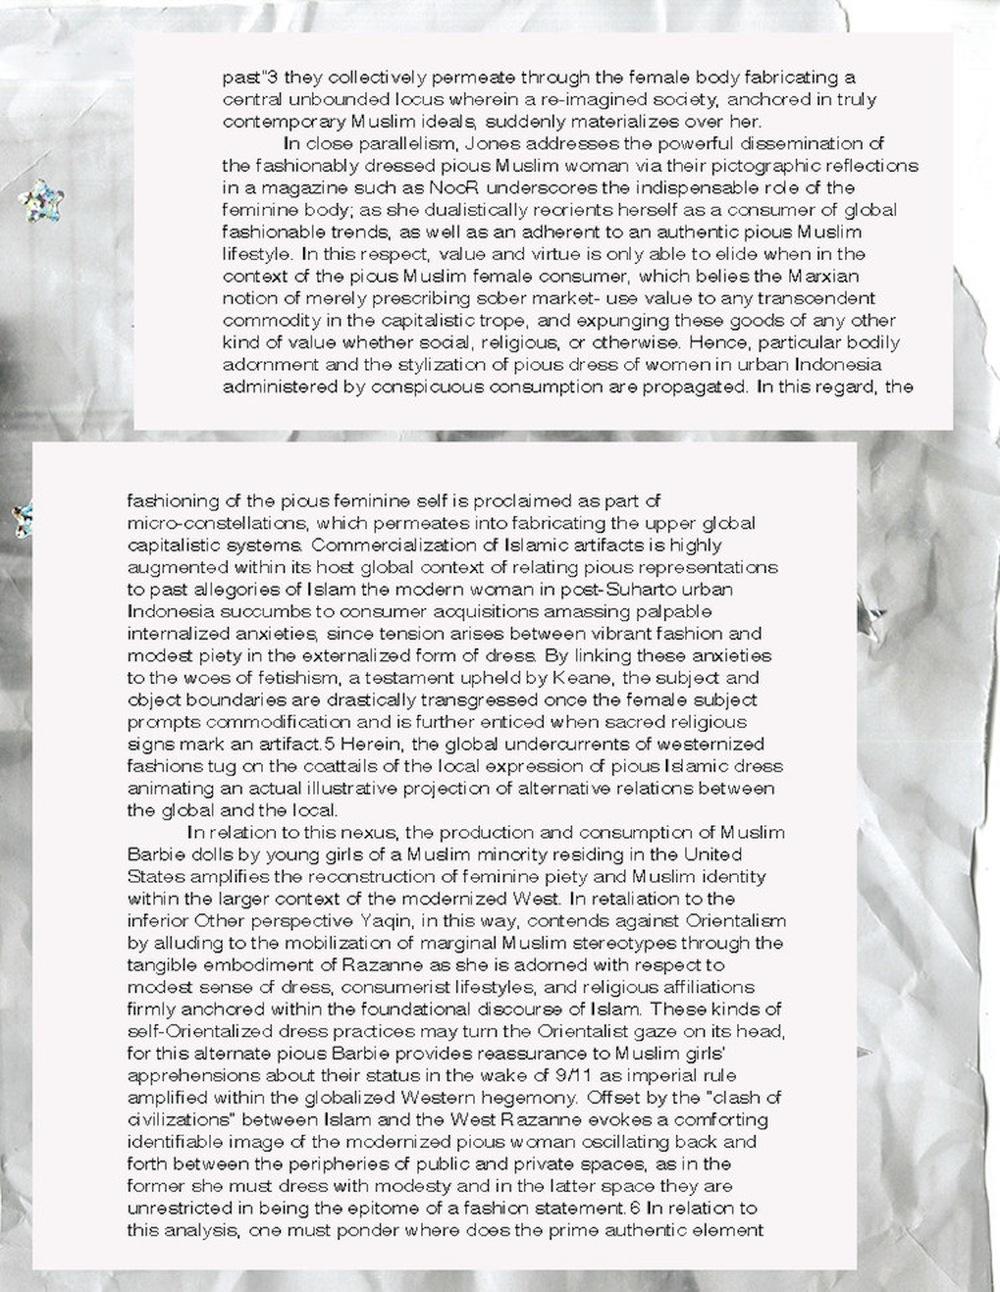 academic_fashioning-piety_2.jpg